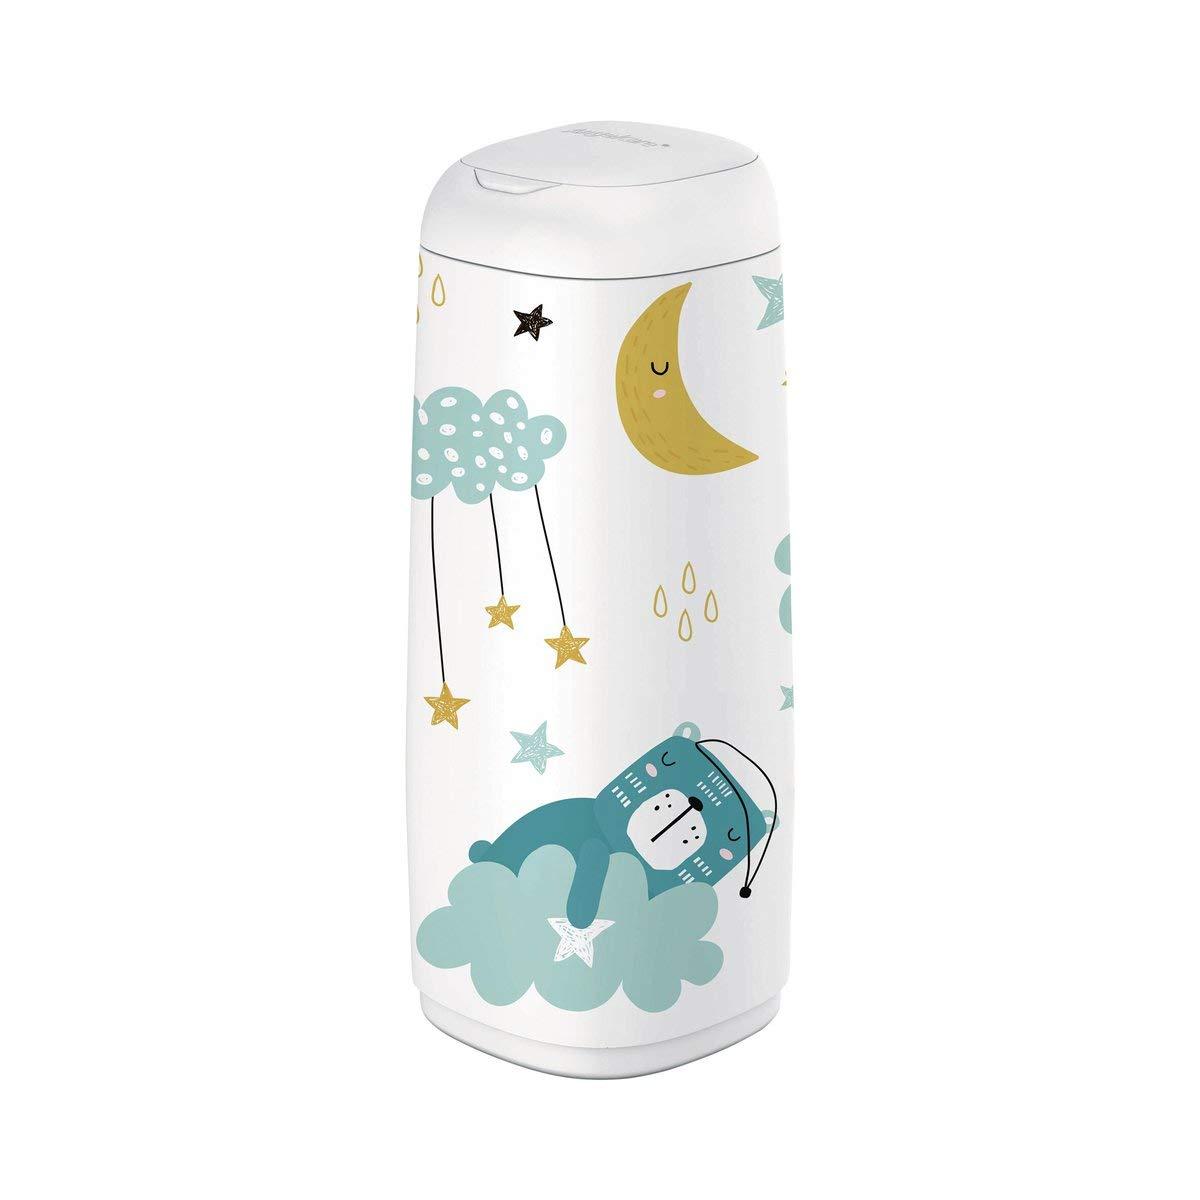 2385 Angelcare Bezug f/ür Dress-Up XL Windeleimer 66 cm H/öhe Sleepy Bear